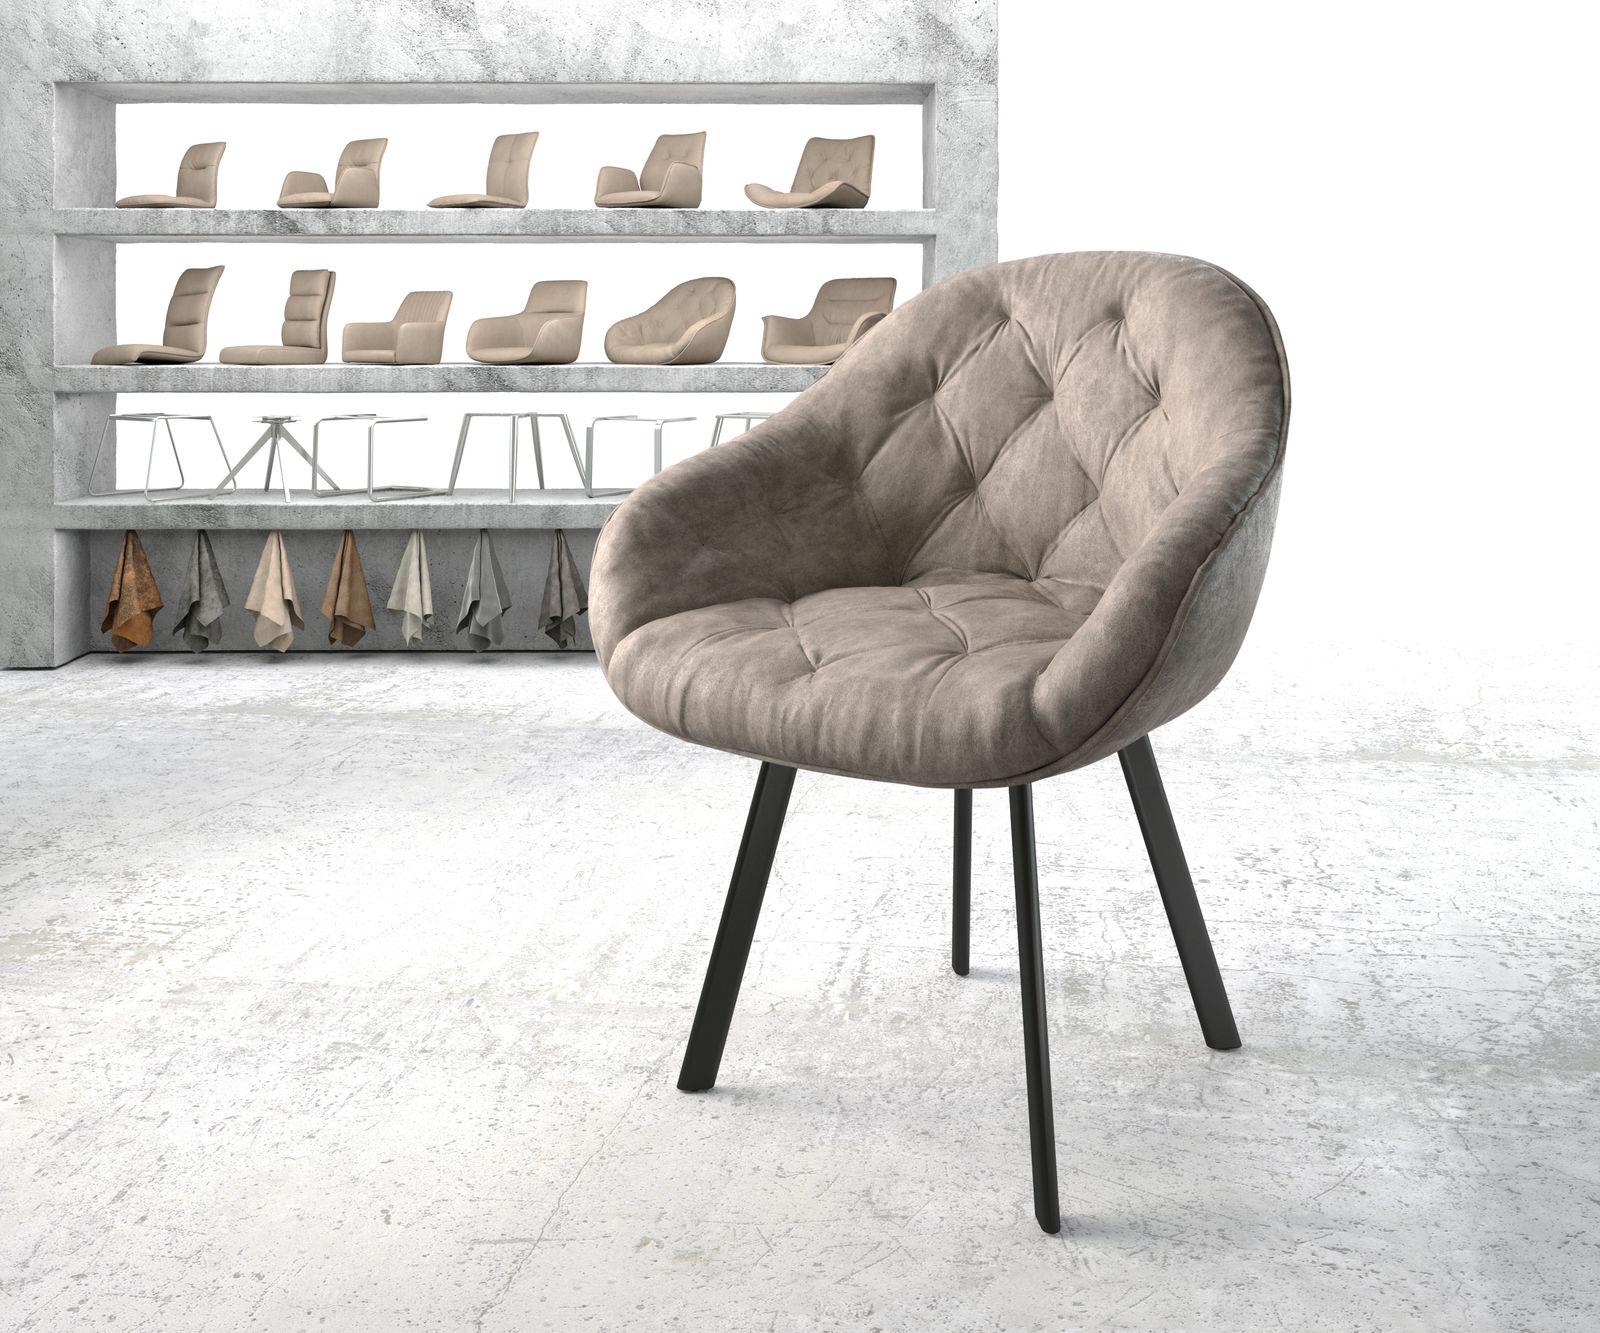 delife-armlehnstuhl-gaio-flex-taupe-vintage-4-fu-oval-schwarz-esszimmerstuhle